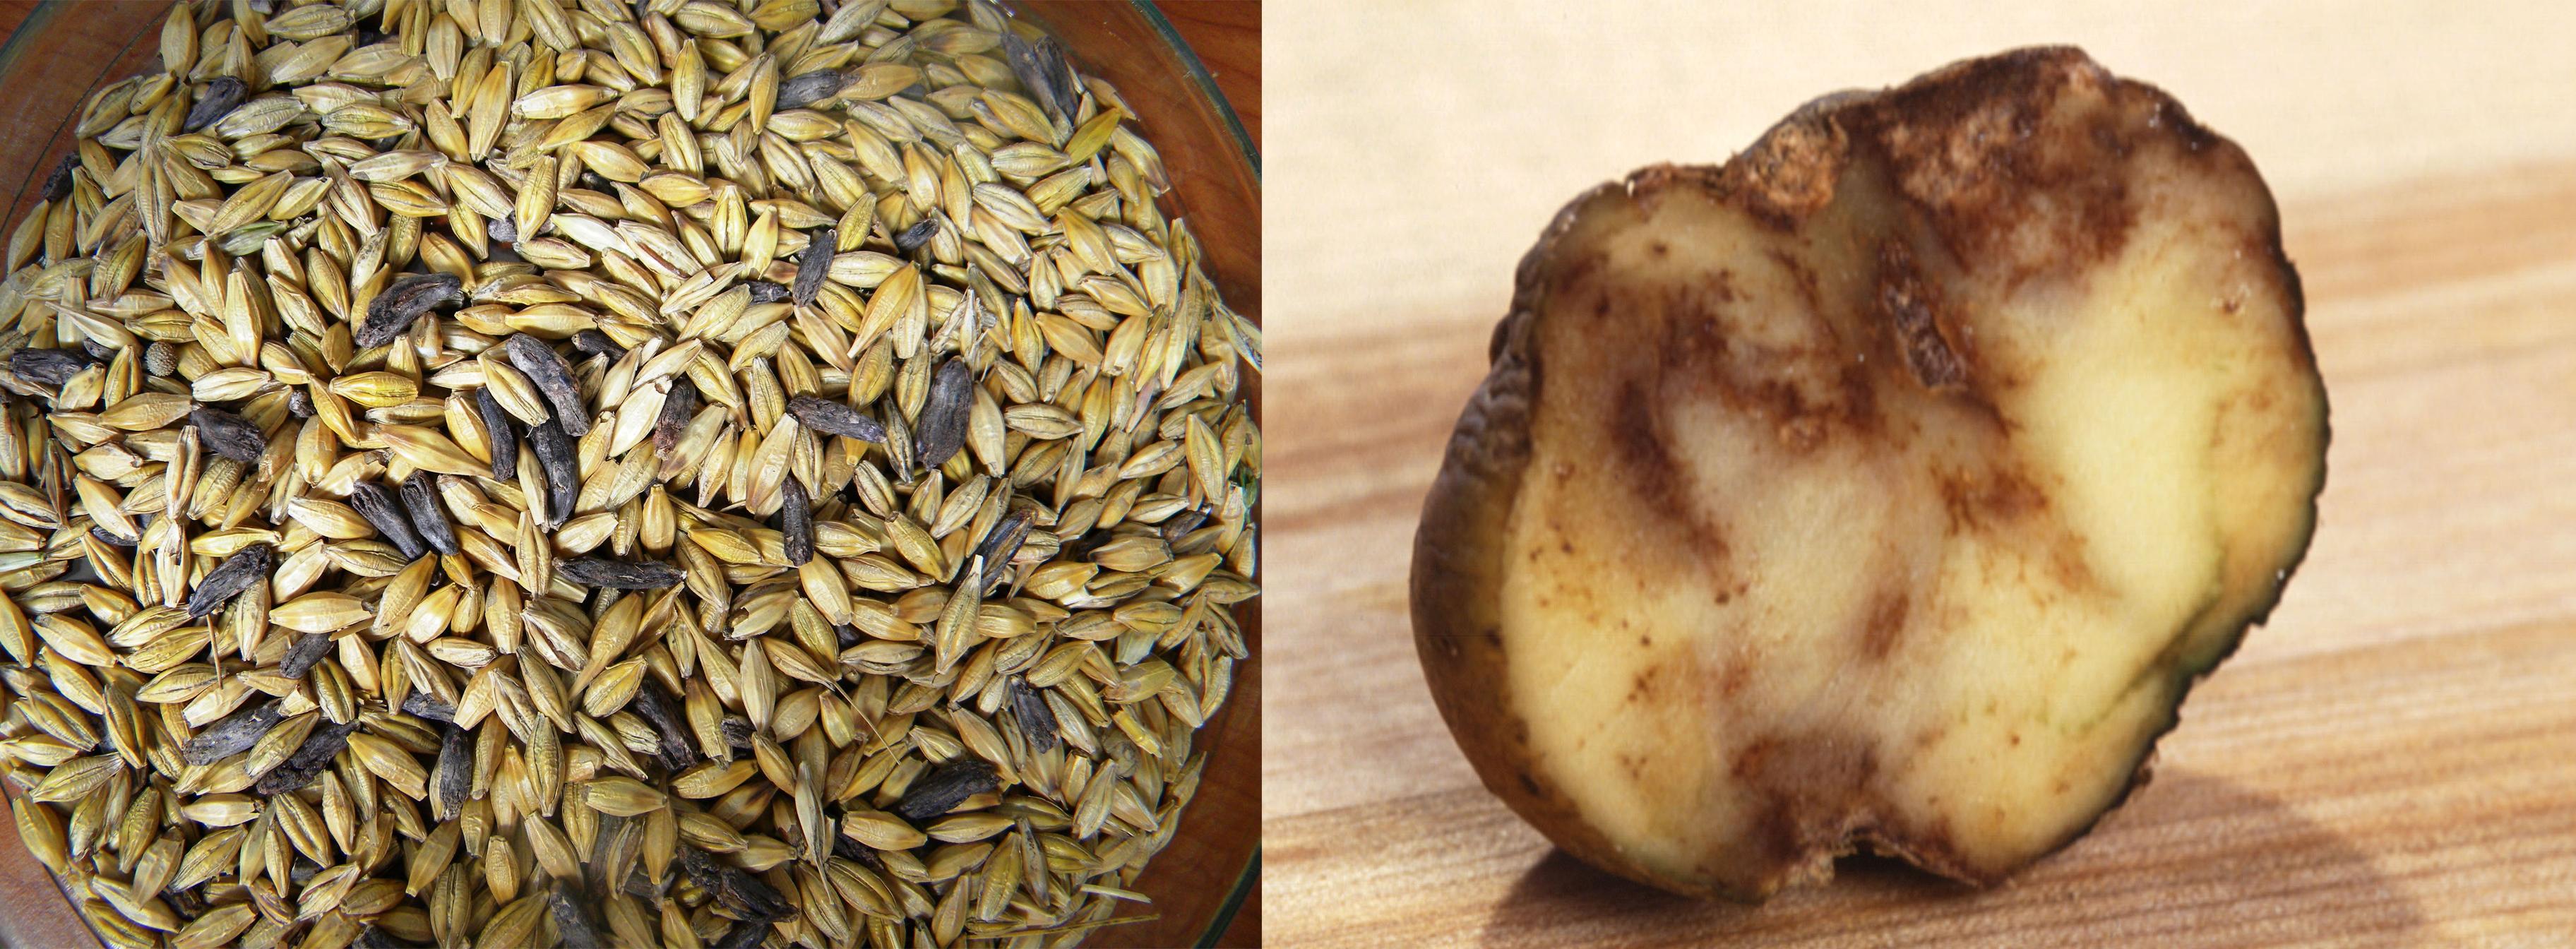 Meldrøje og kartoffelskimmel